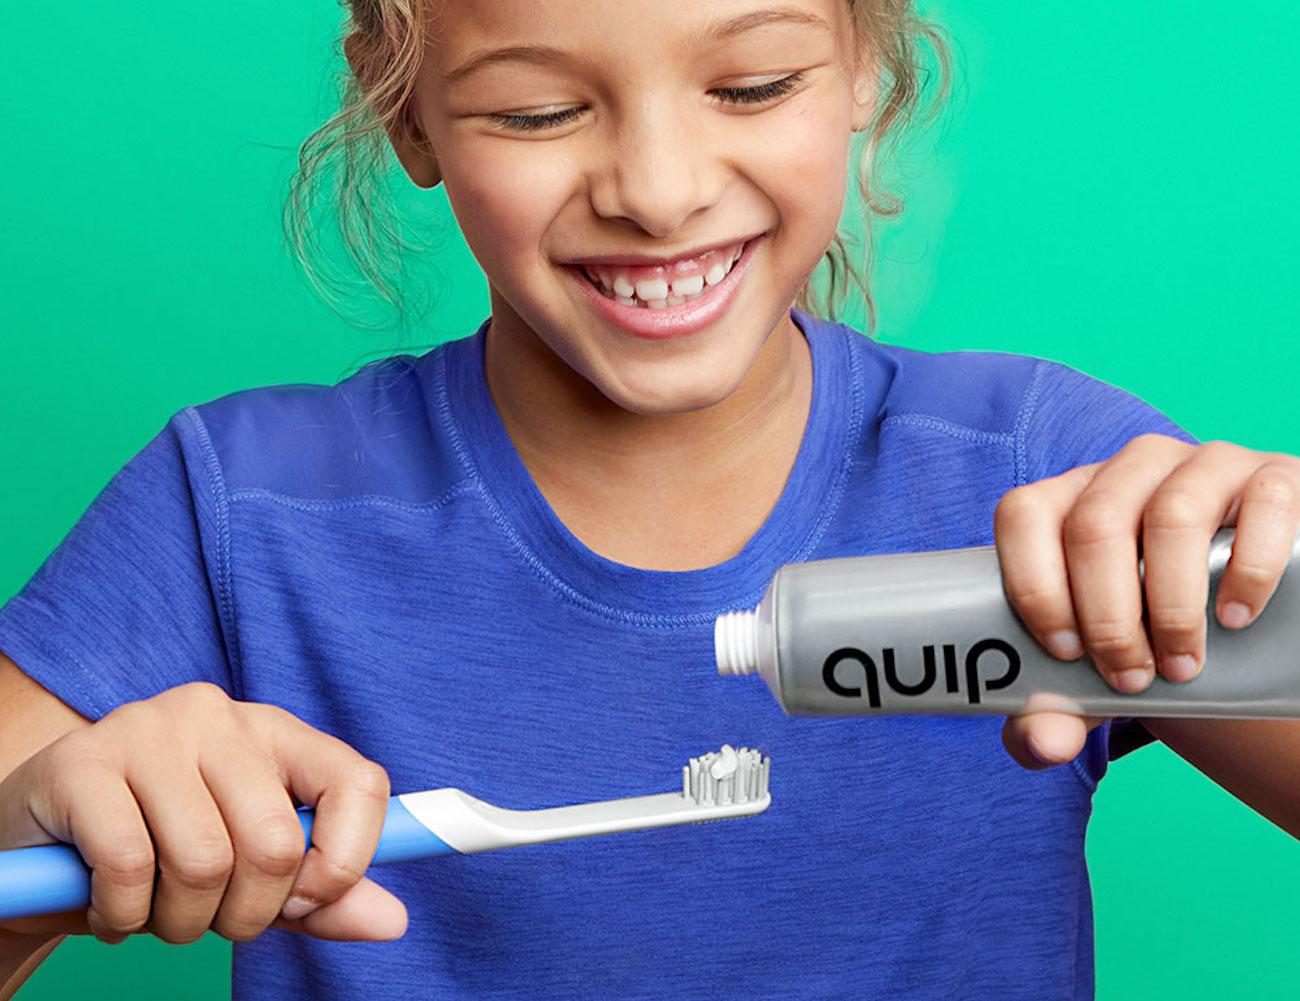 quip Kids Electric Toothbrush Set improves children's toothbrushing time